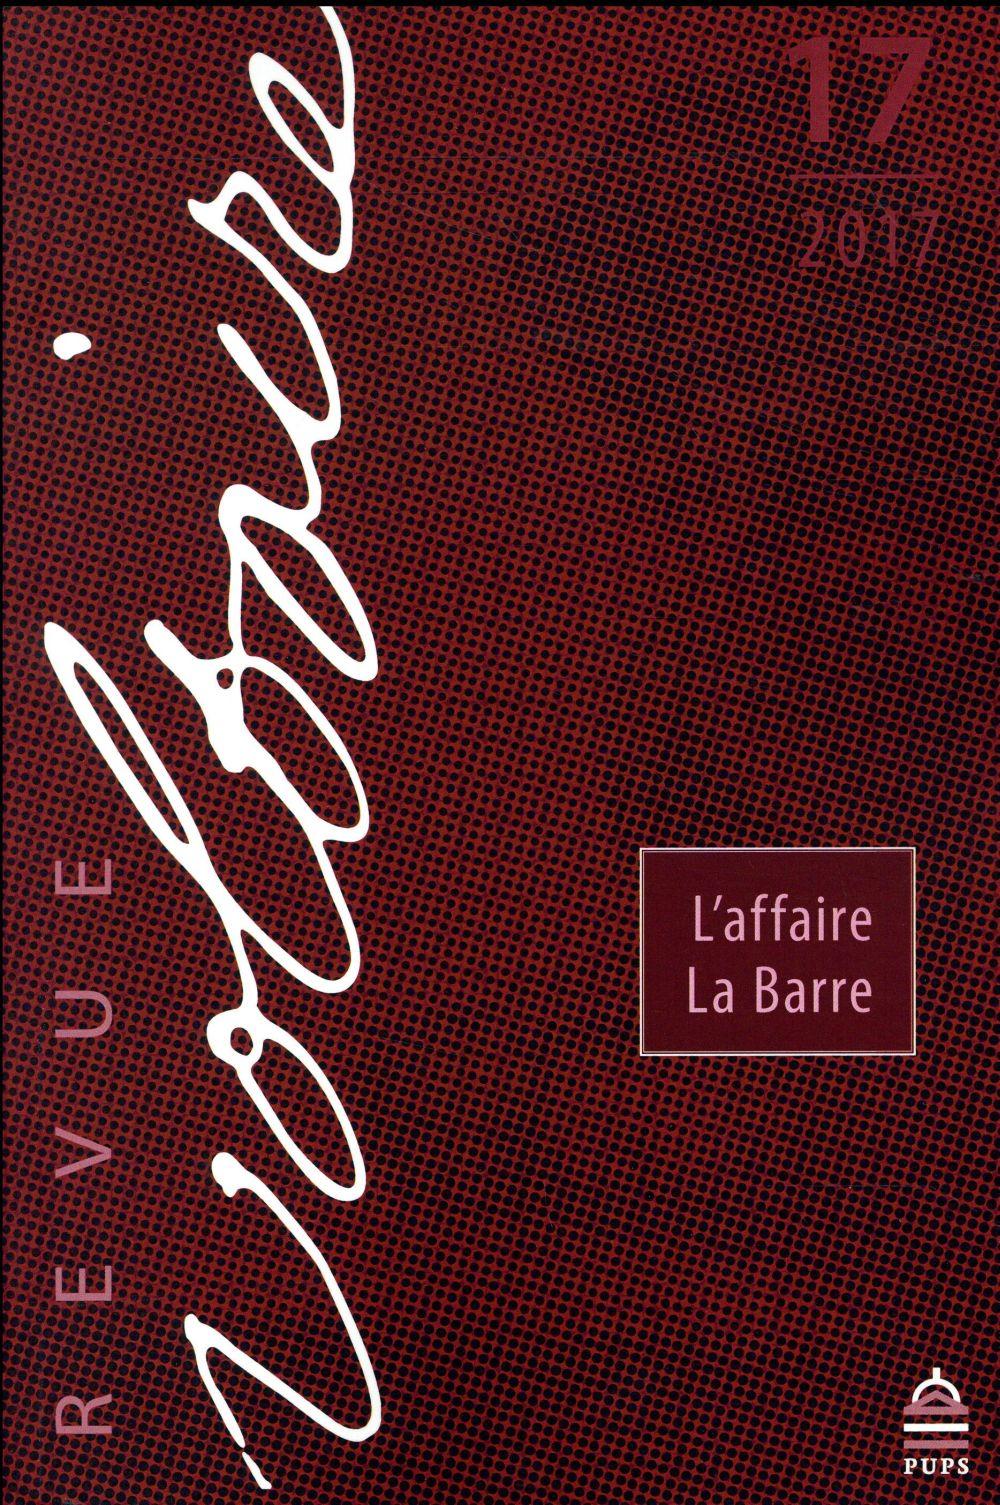 L'AFFAIRE LA BARRE - REVUE VOLTAIRE 17